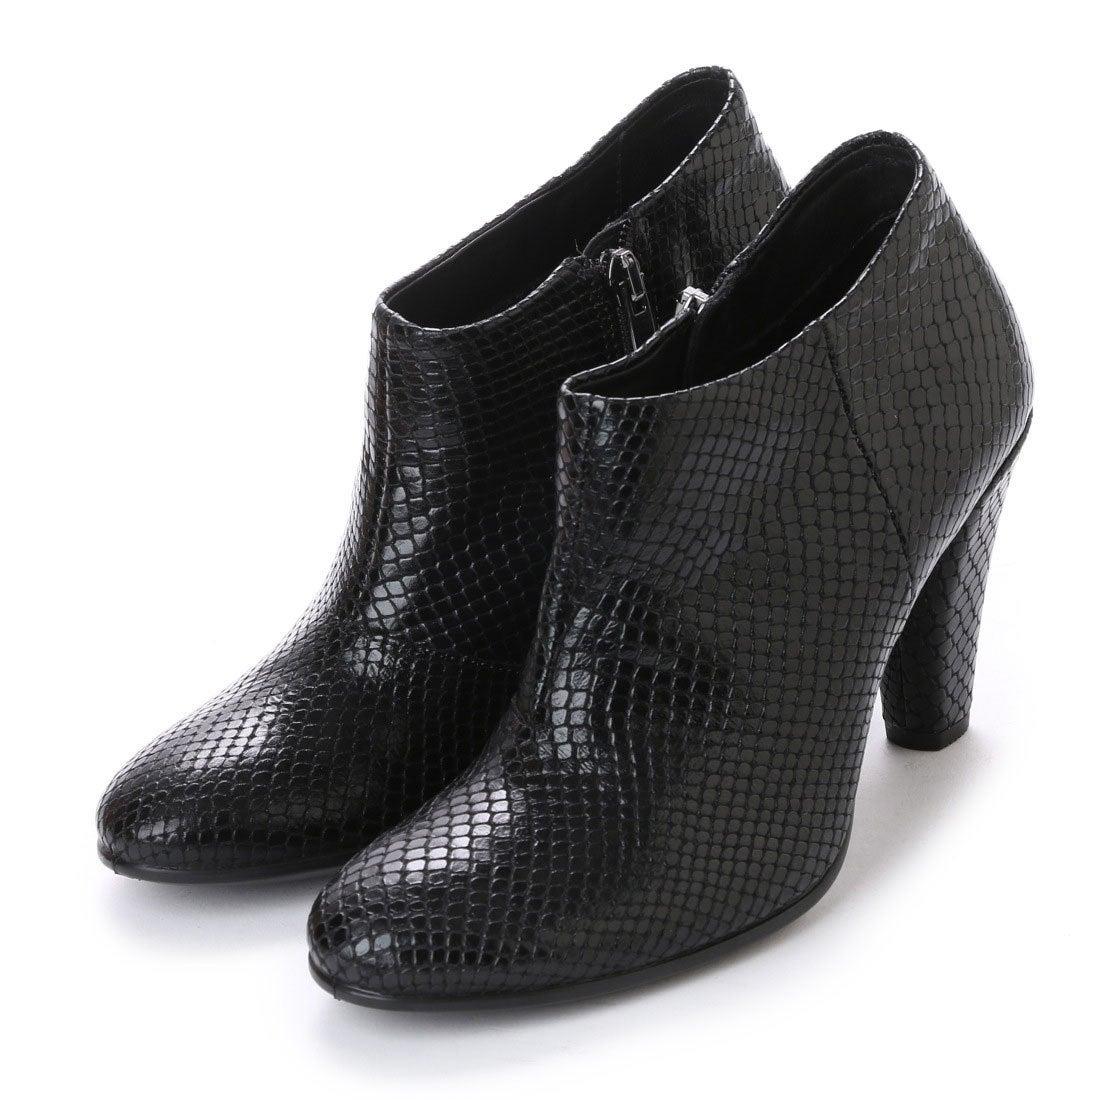 Ecco Leather White Shoes Size 38 Elegant Shape Women's Shoes